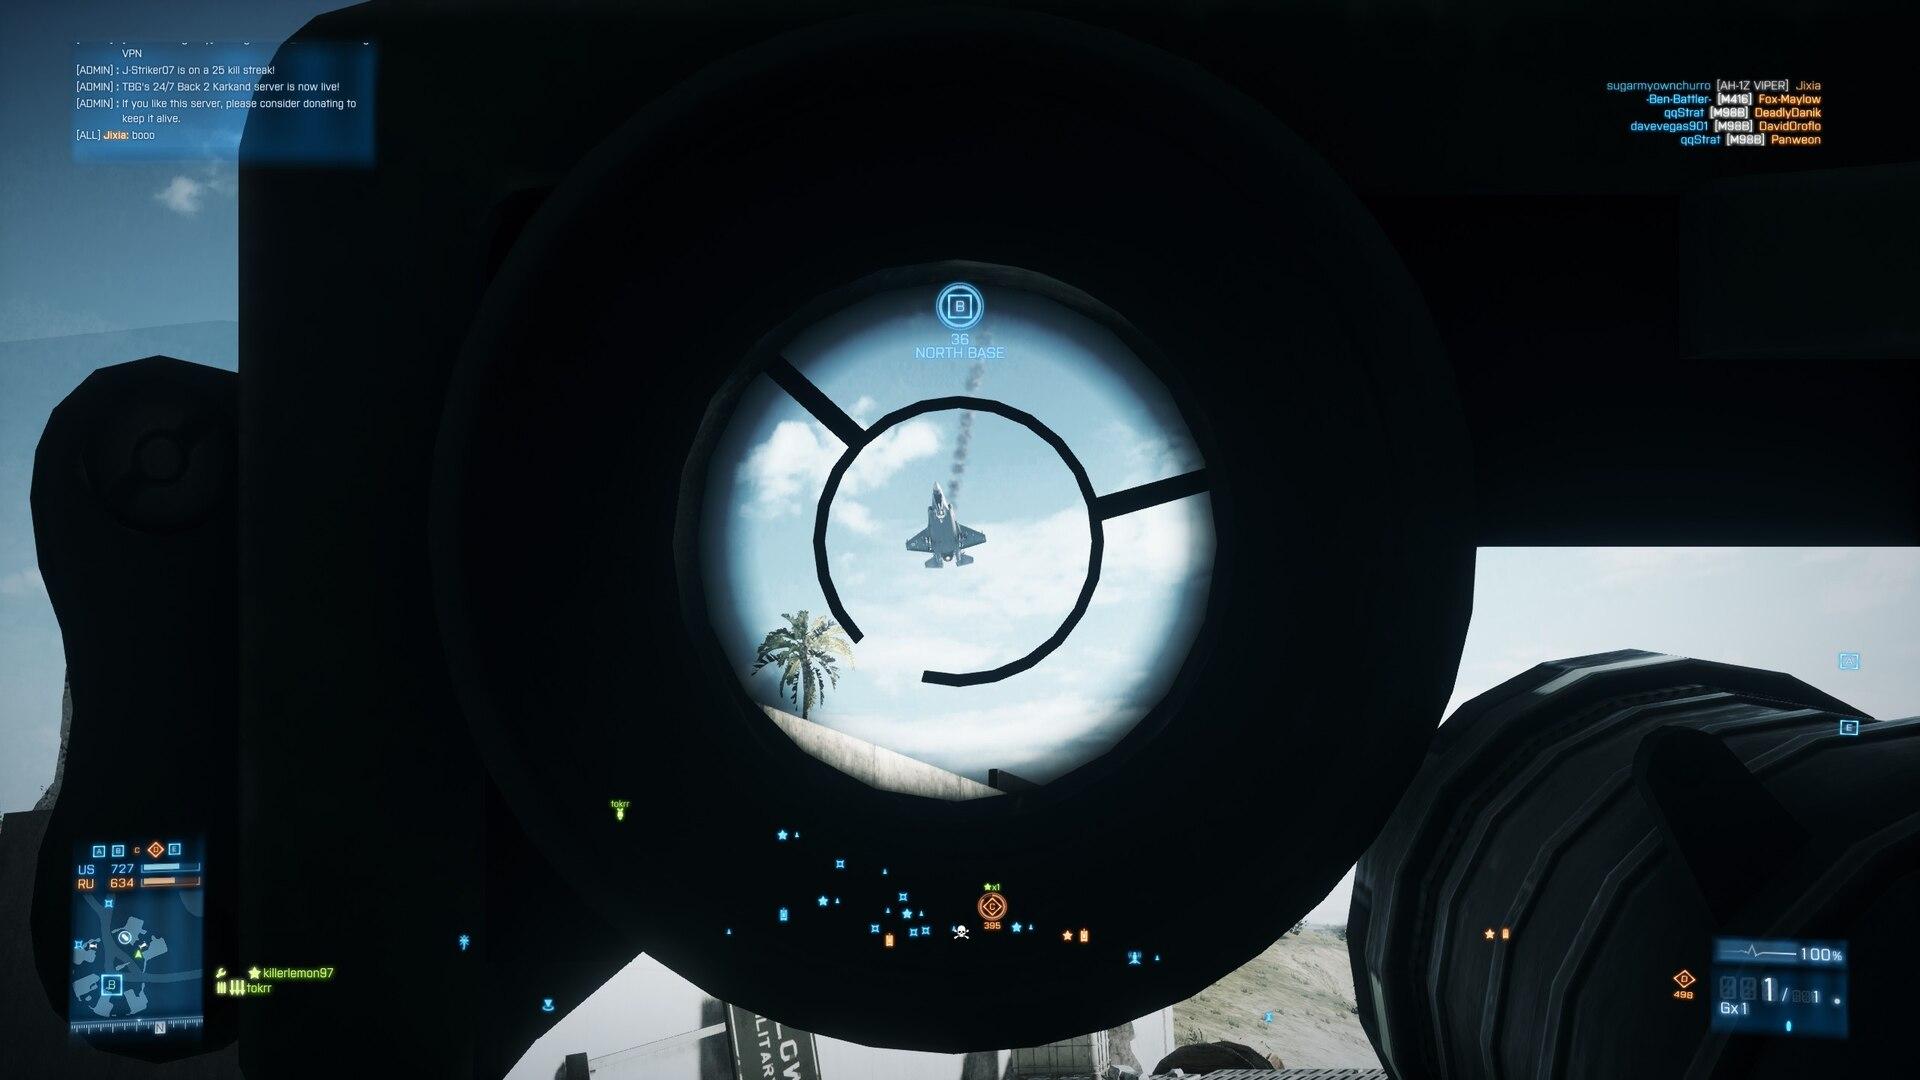 gfhbrdgfvgv.jpg - Battlefield 3